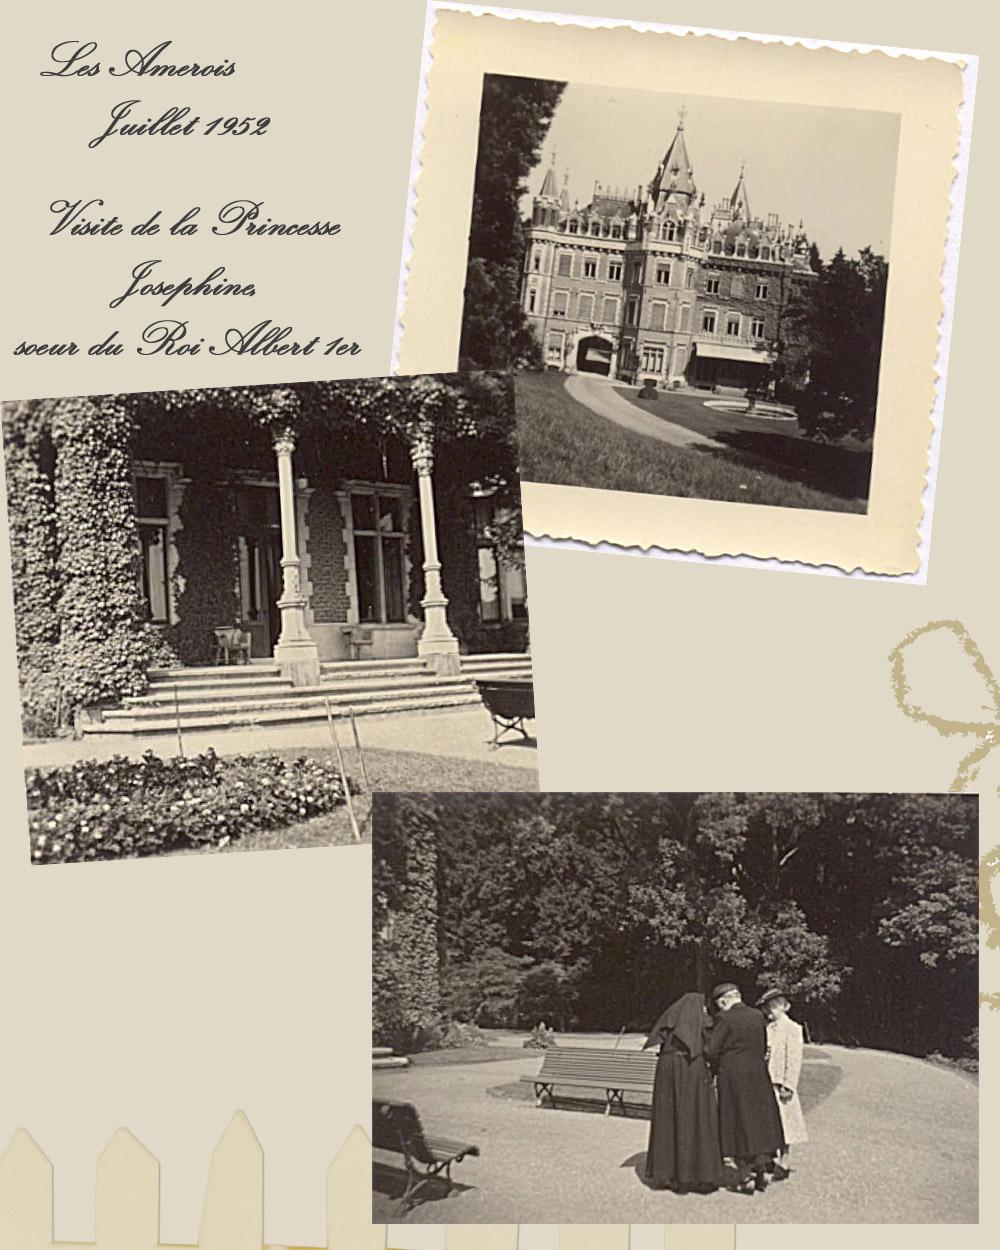 les amerois juillet 1952 visite Princesse Josephine